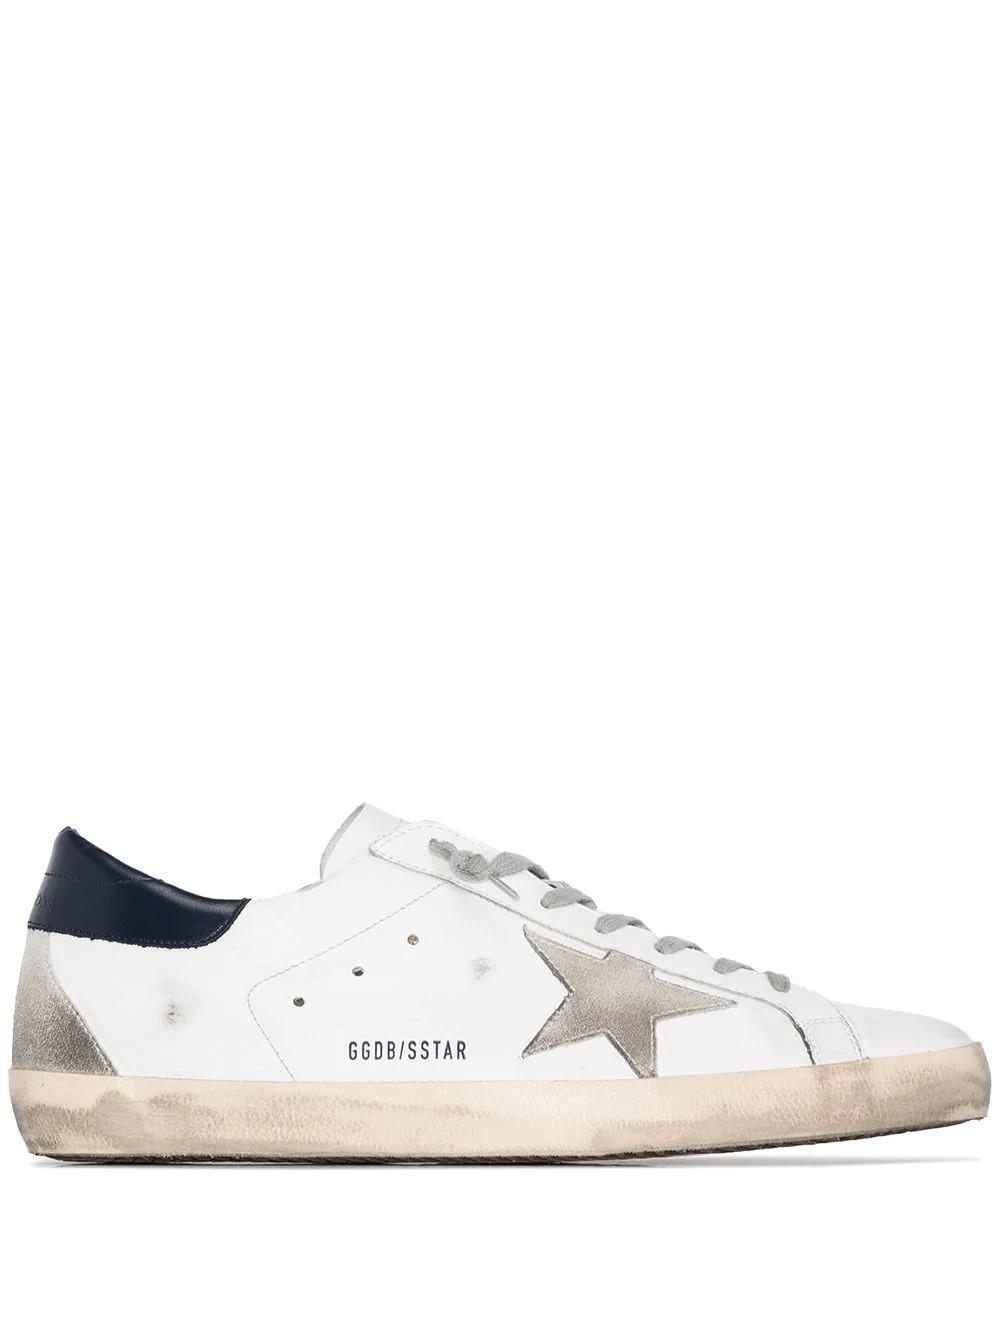 Golden Goose Superstar板鞋